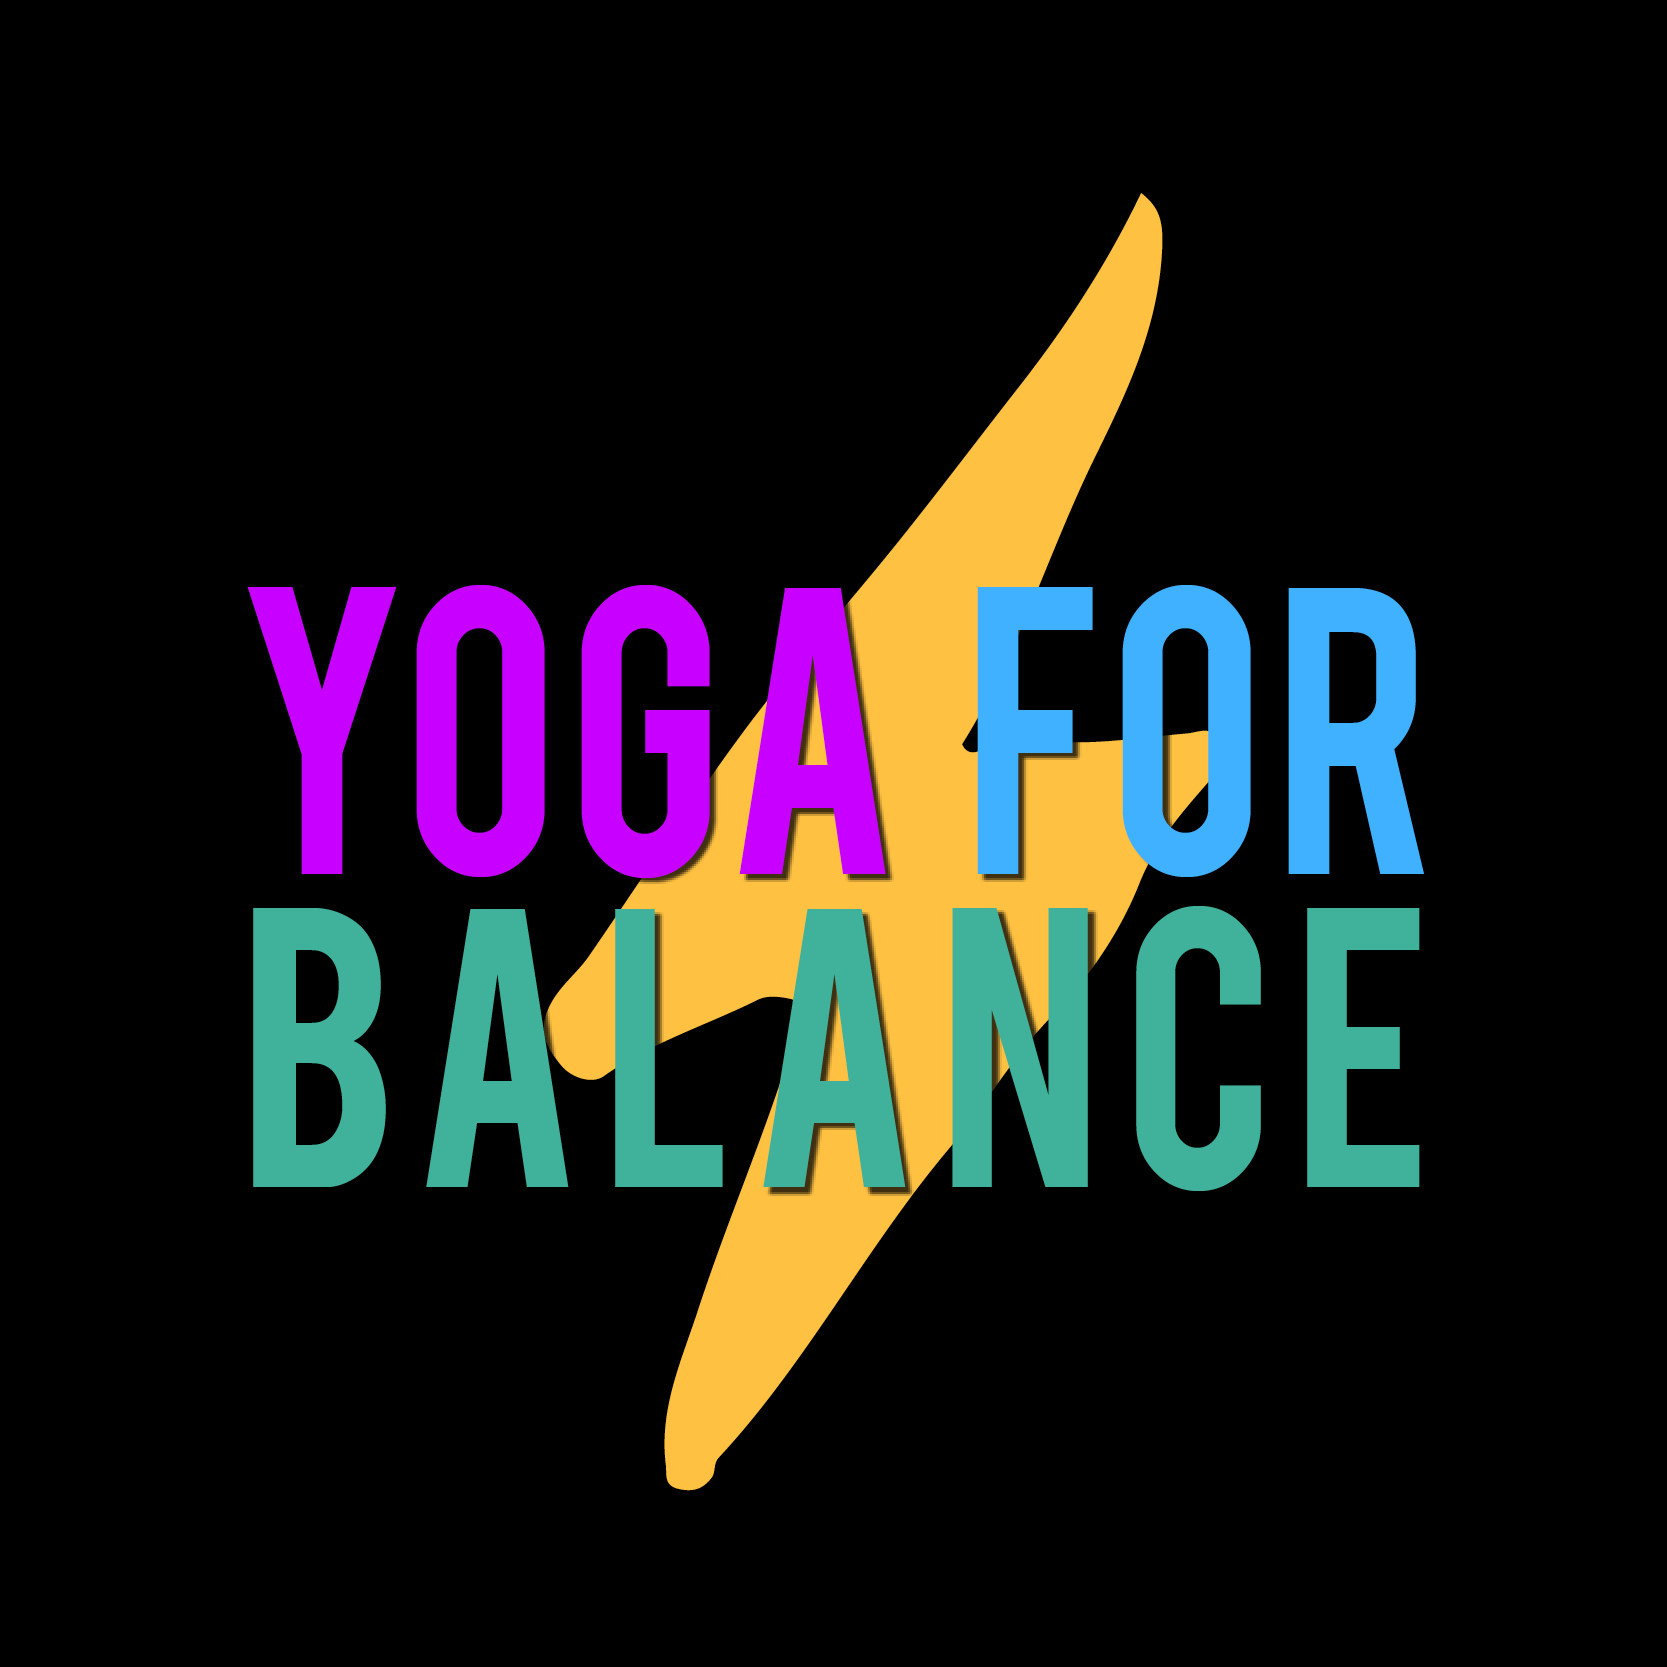 yogaforbalance.jpg